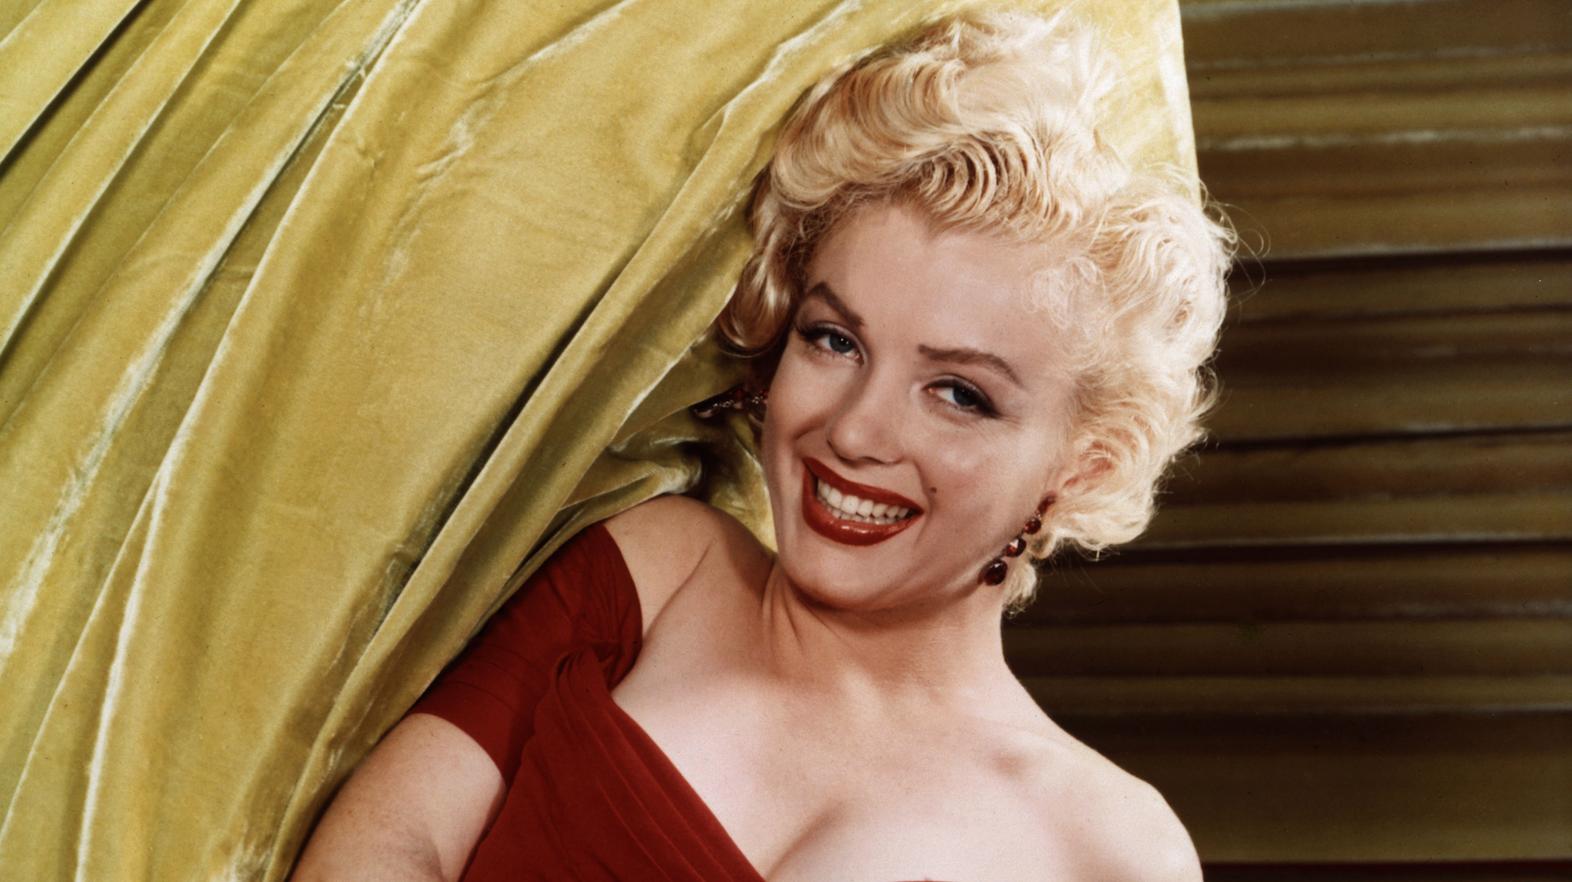 Killing of Marilyn Monroe' Podcast Episode 2 Explores Her